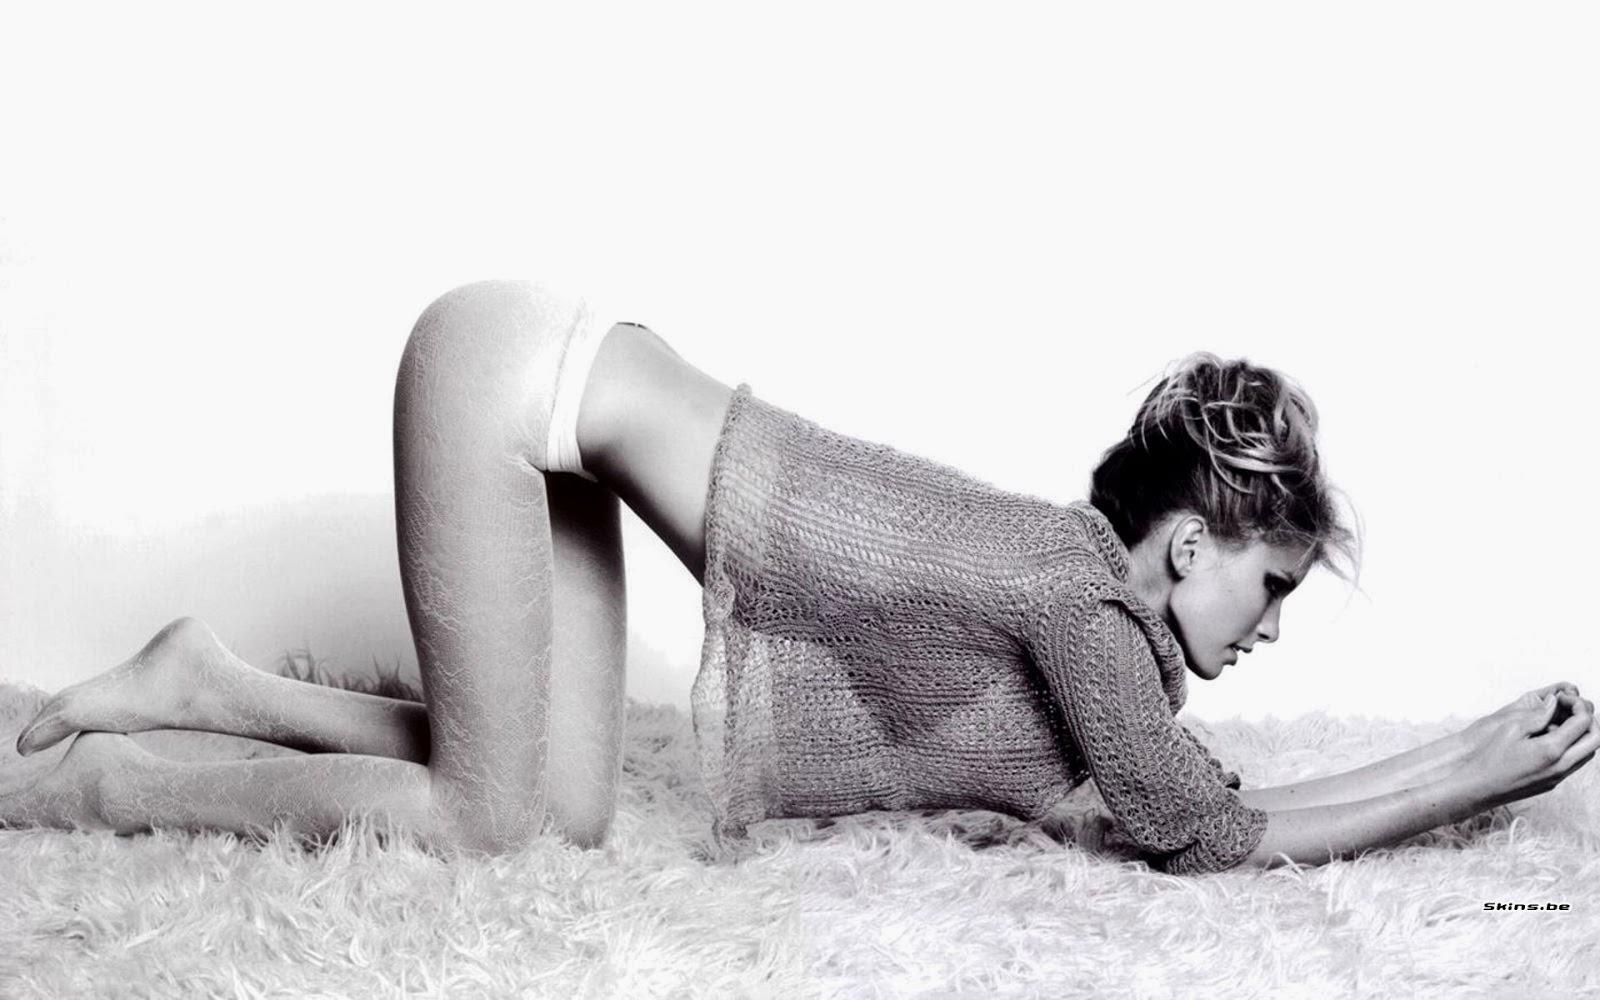 Nude Pictures Of Marisa Miller 7